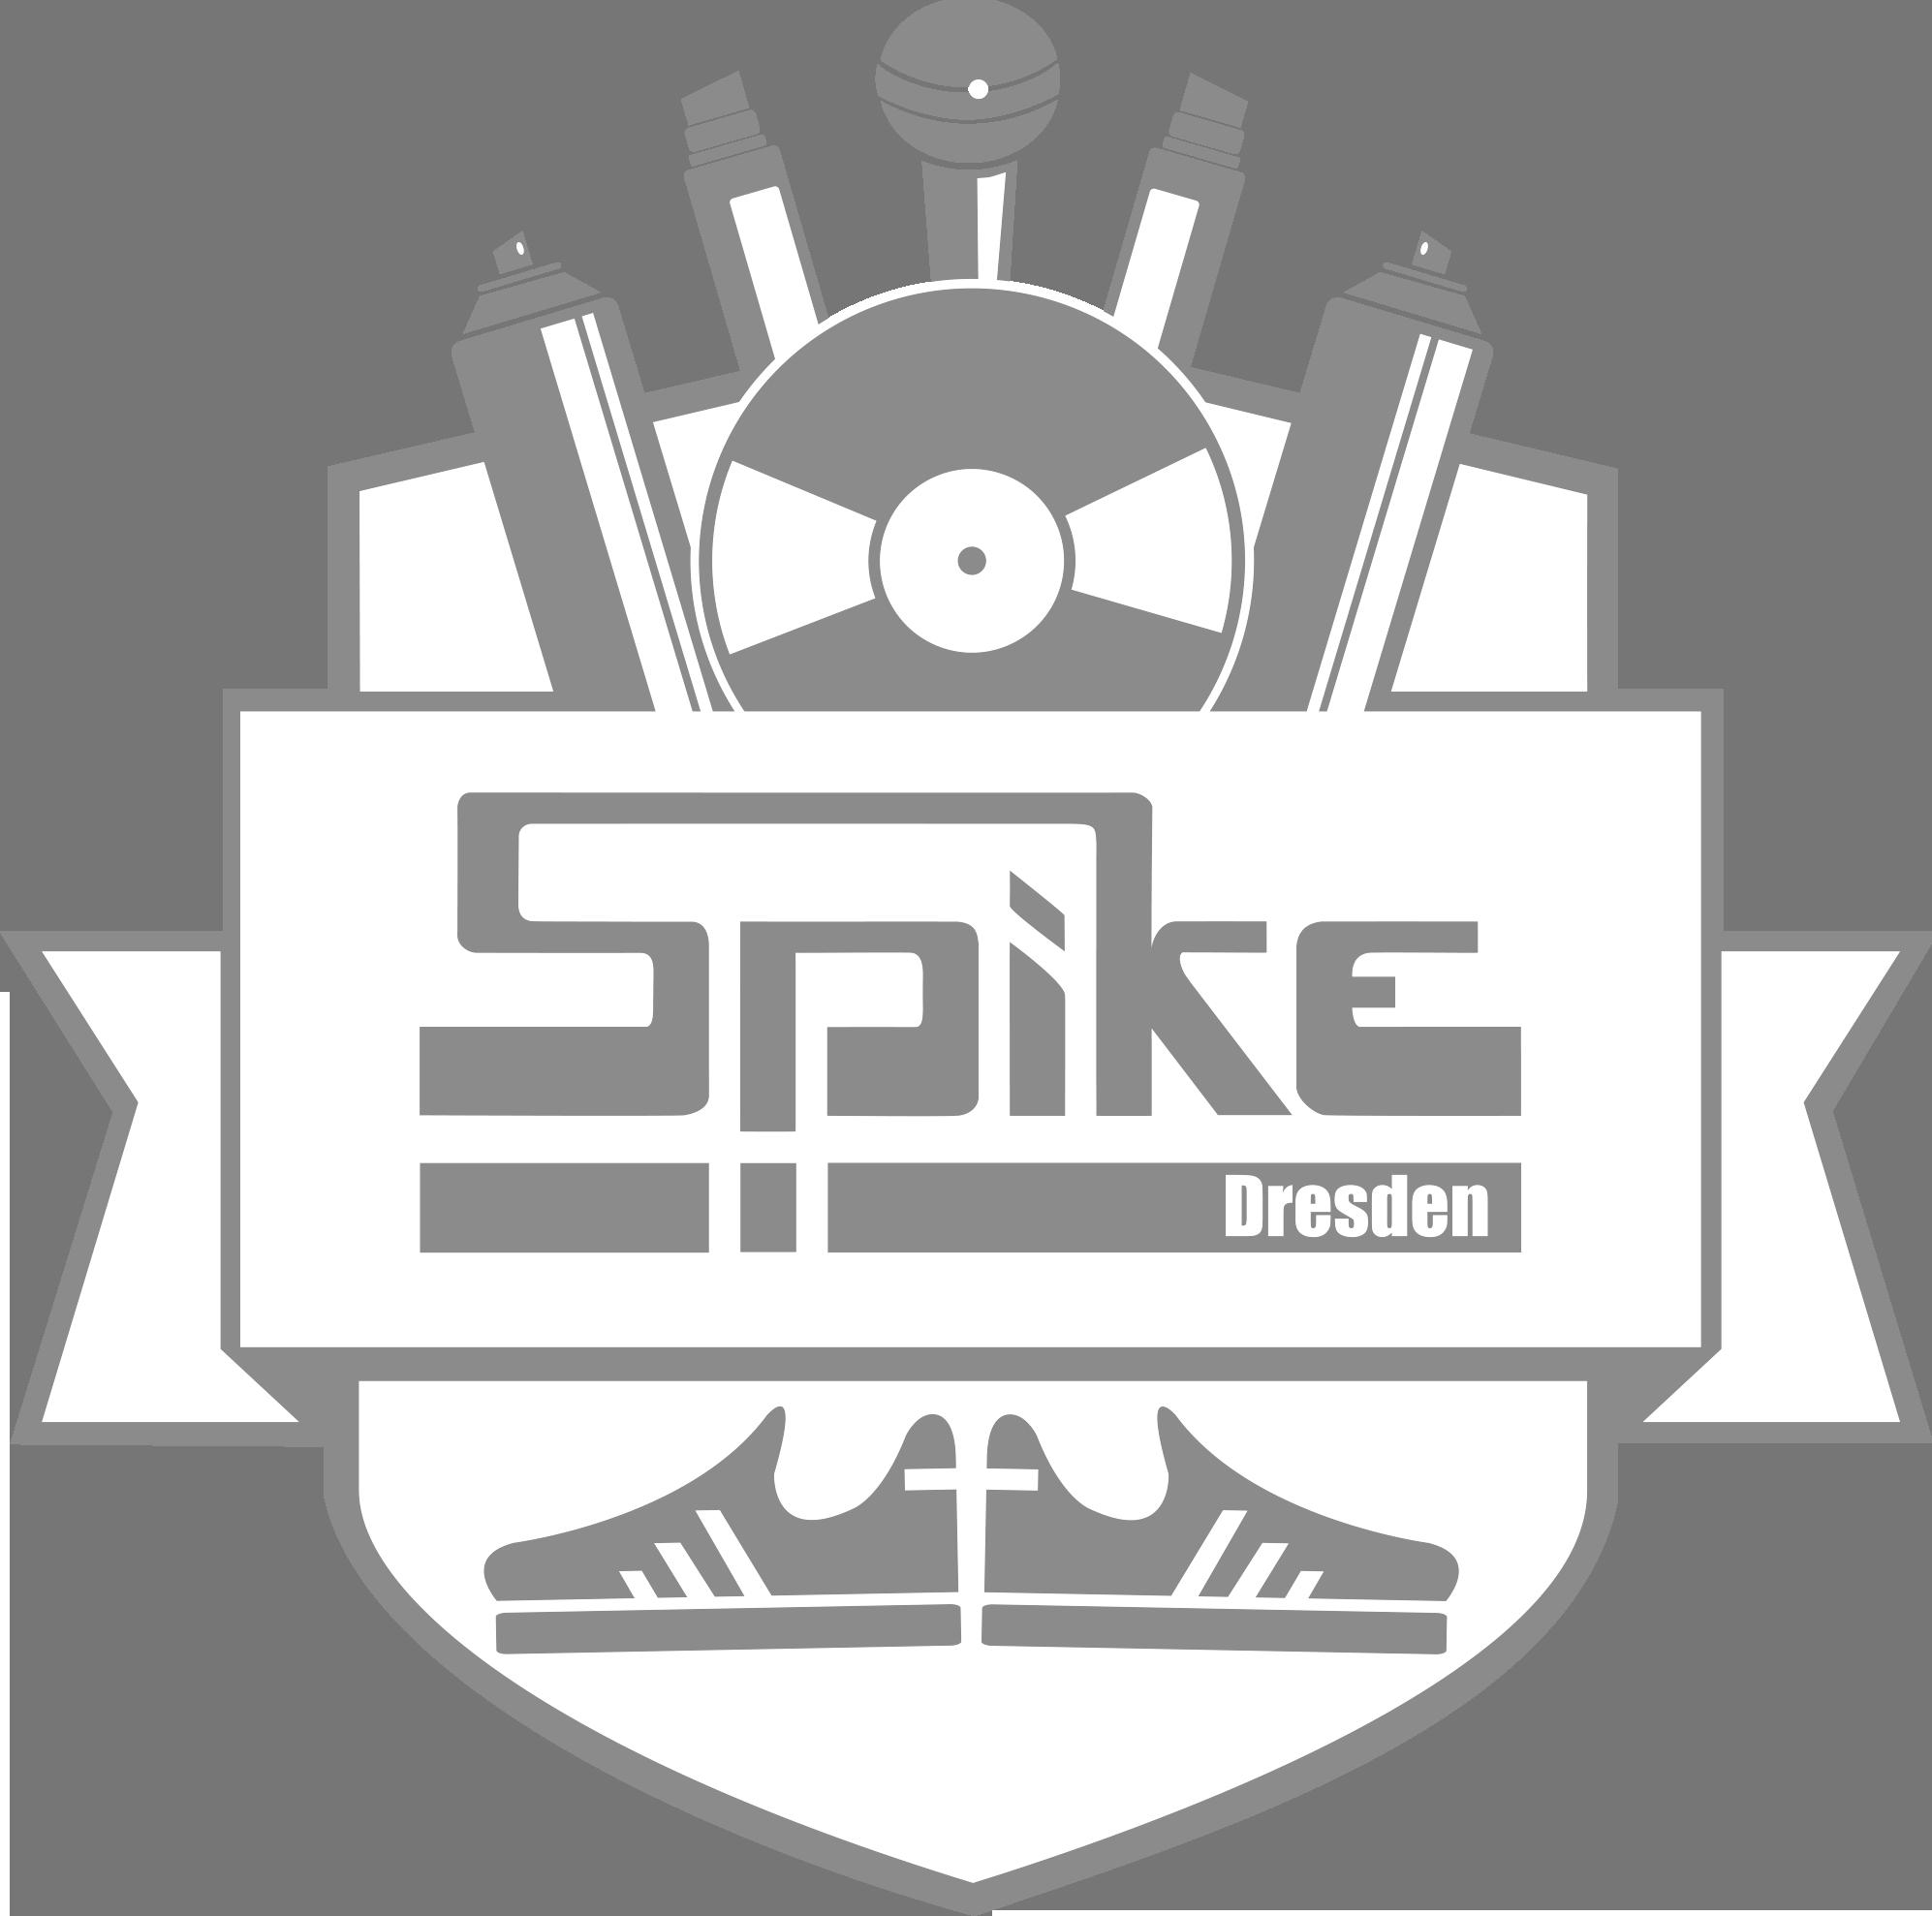 SpikeLogo